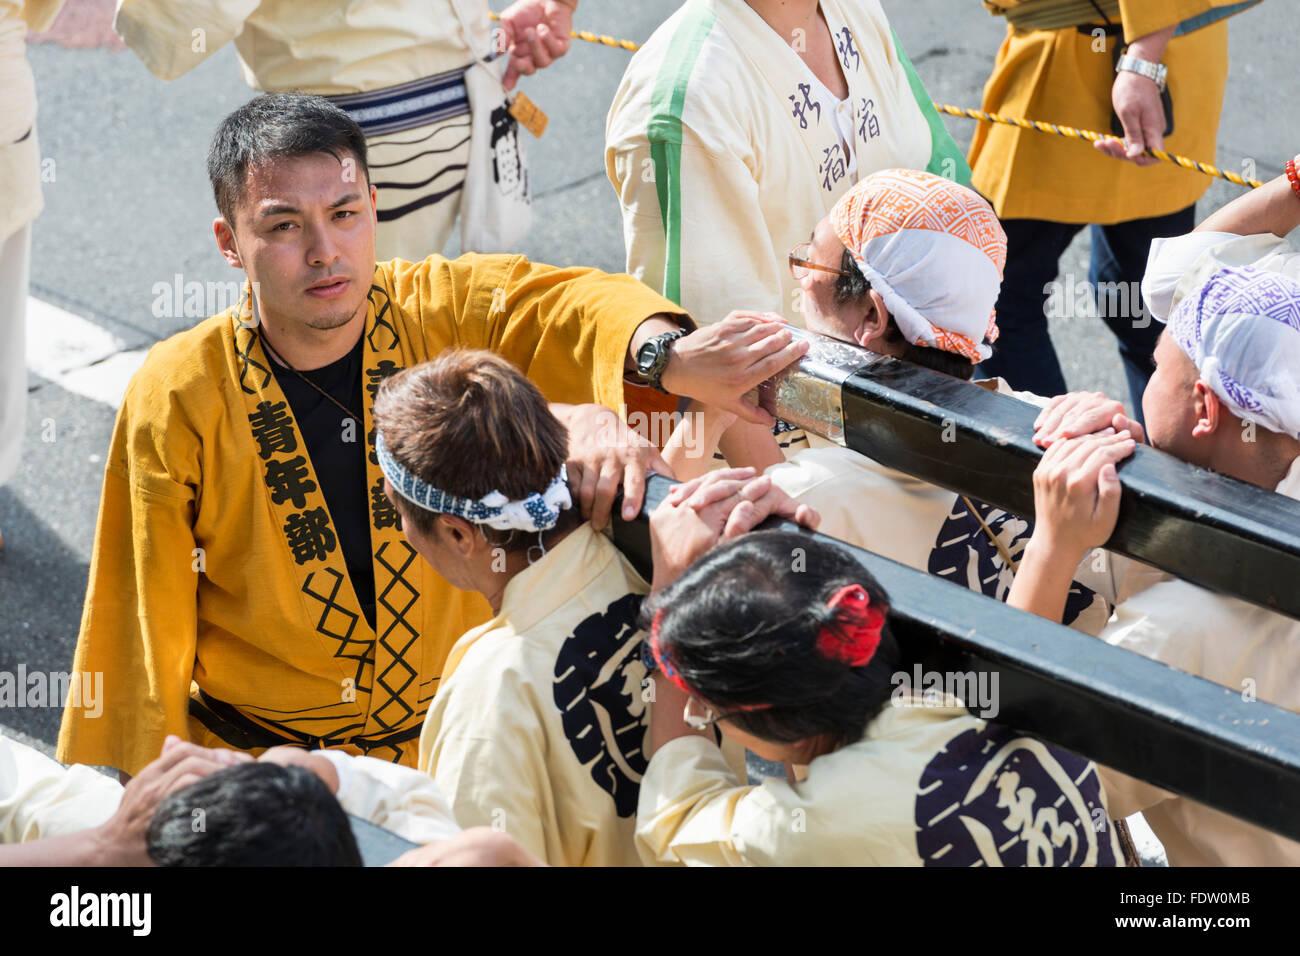 Mikoshi carried at the Grand Festival of Hanazono Shrine, Shinjuku, Tokyo, Japan - Stock Image